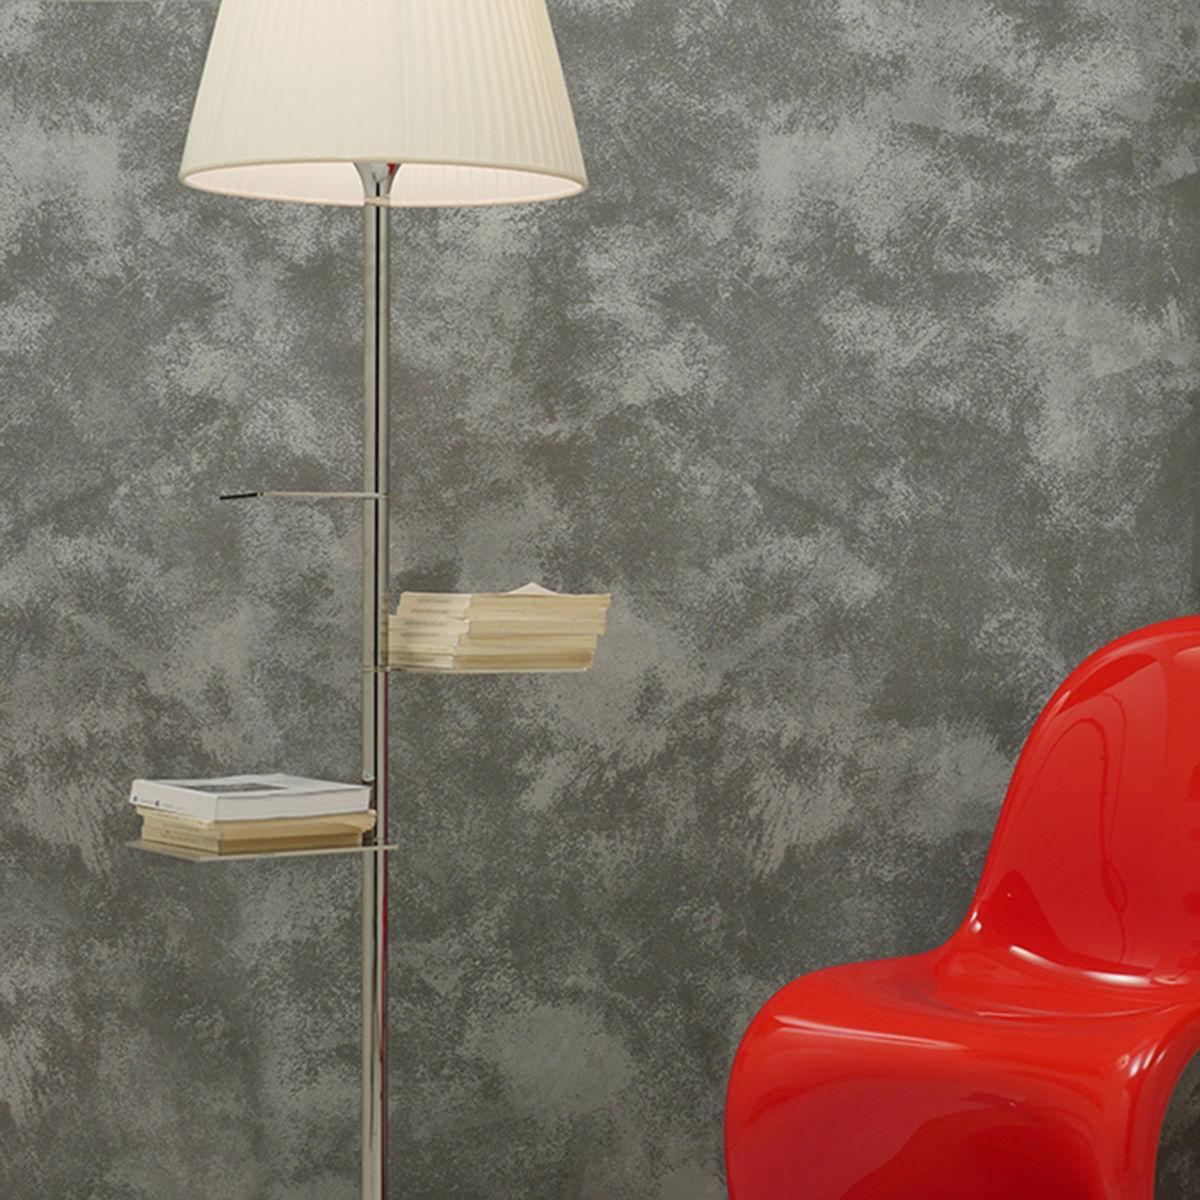 Pitture decorative per pareti kk18 regardsdefemmes for Pittura per interni moderne